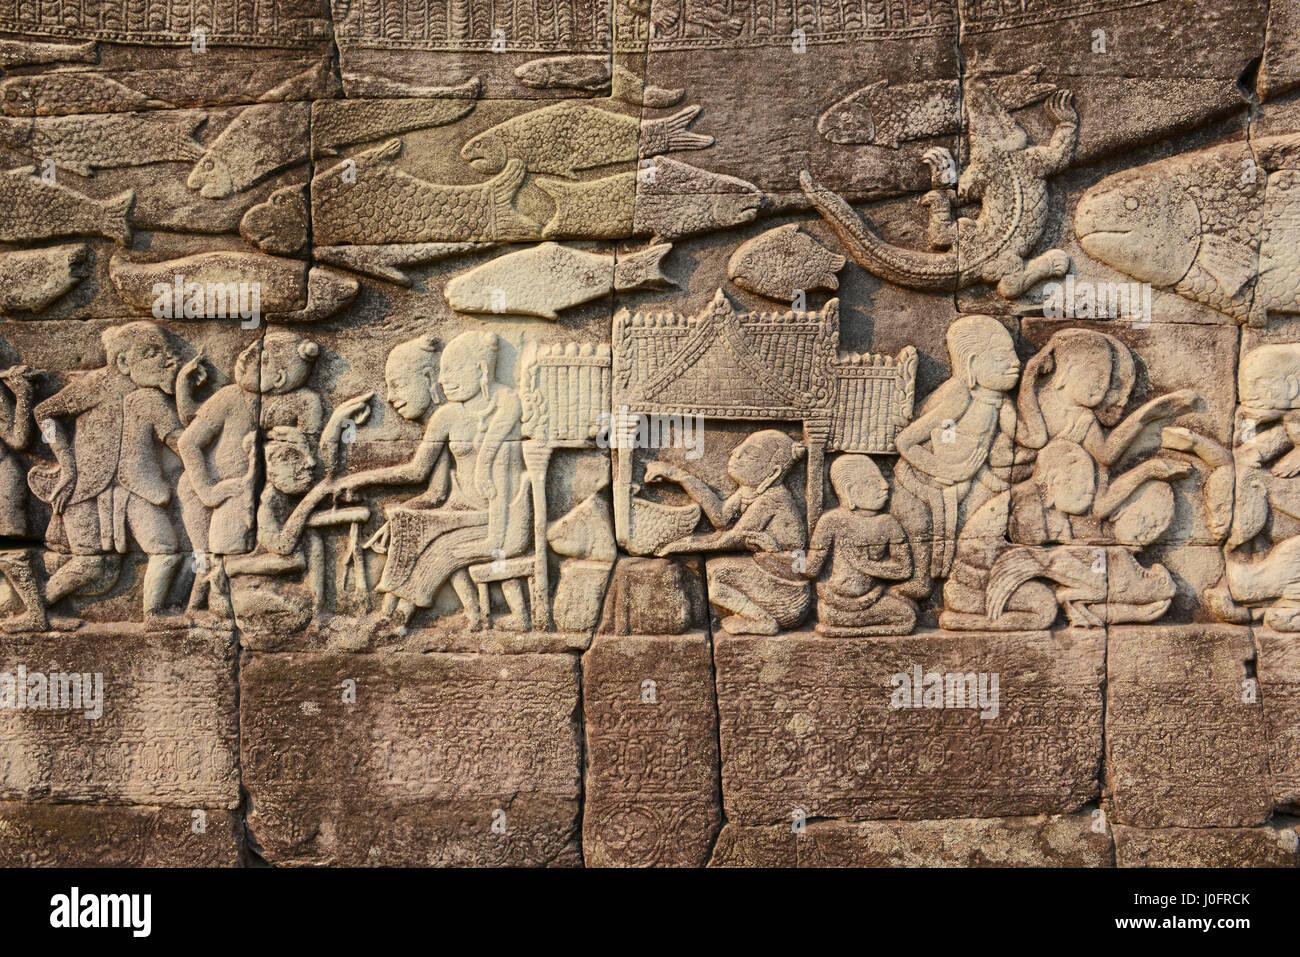 Temples at Angkor Thom, Siem Reap, Cambodia Stock Photo